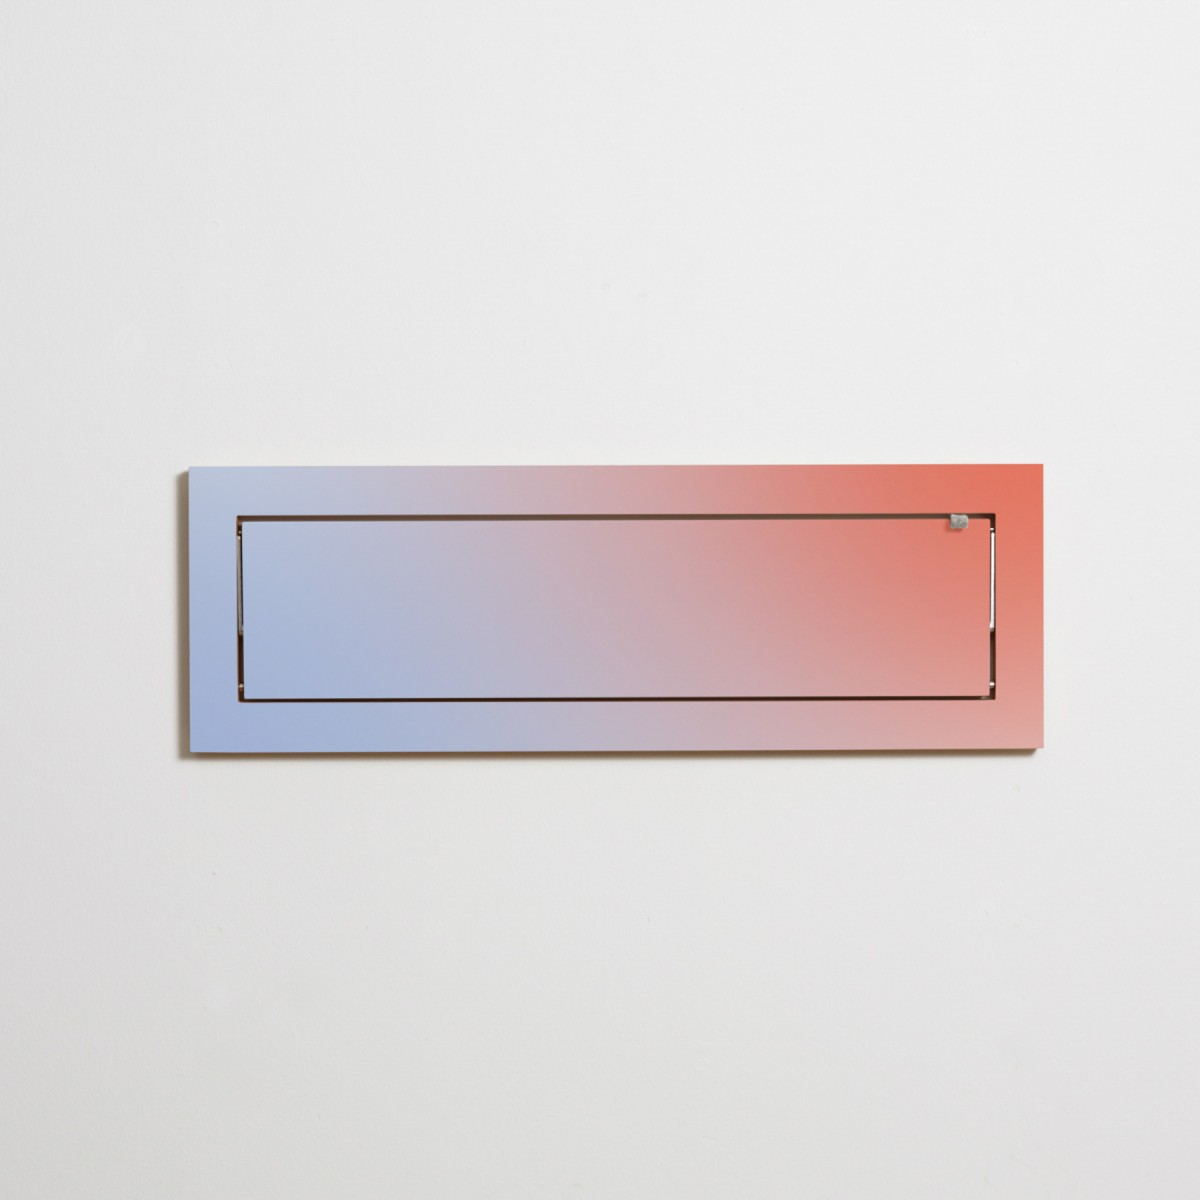 AMBIVALENZ Fläpps Regal 80x27-1 – Sunrise by Joa Herrenknecht